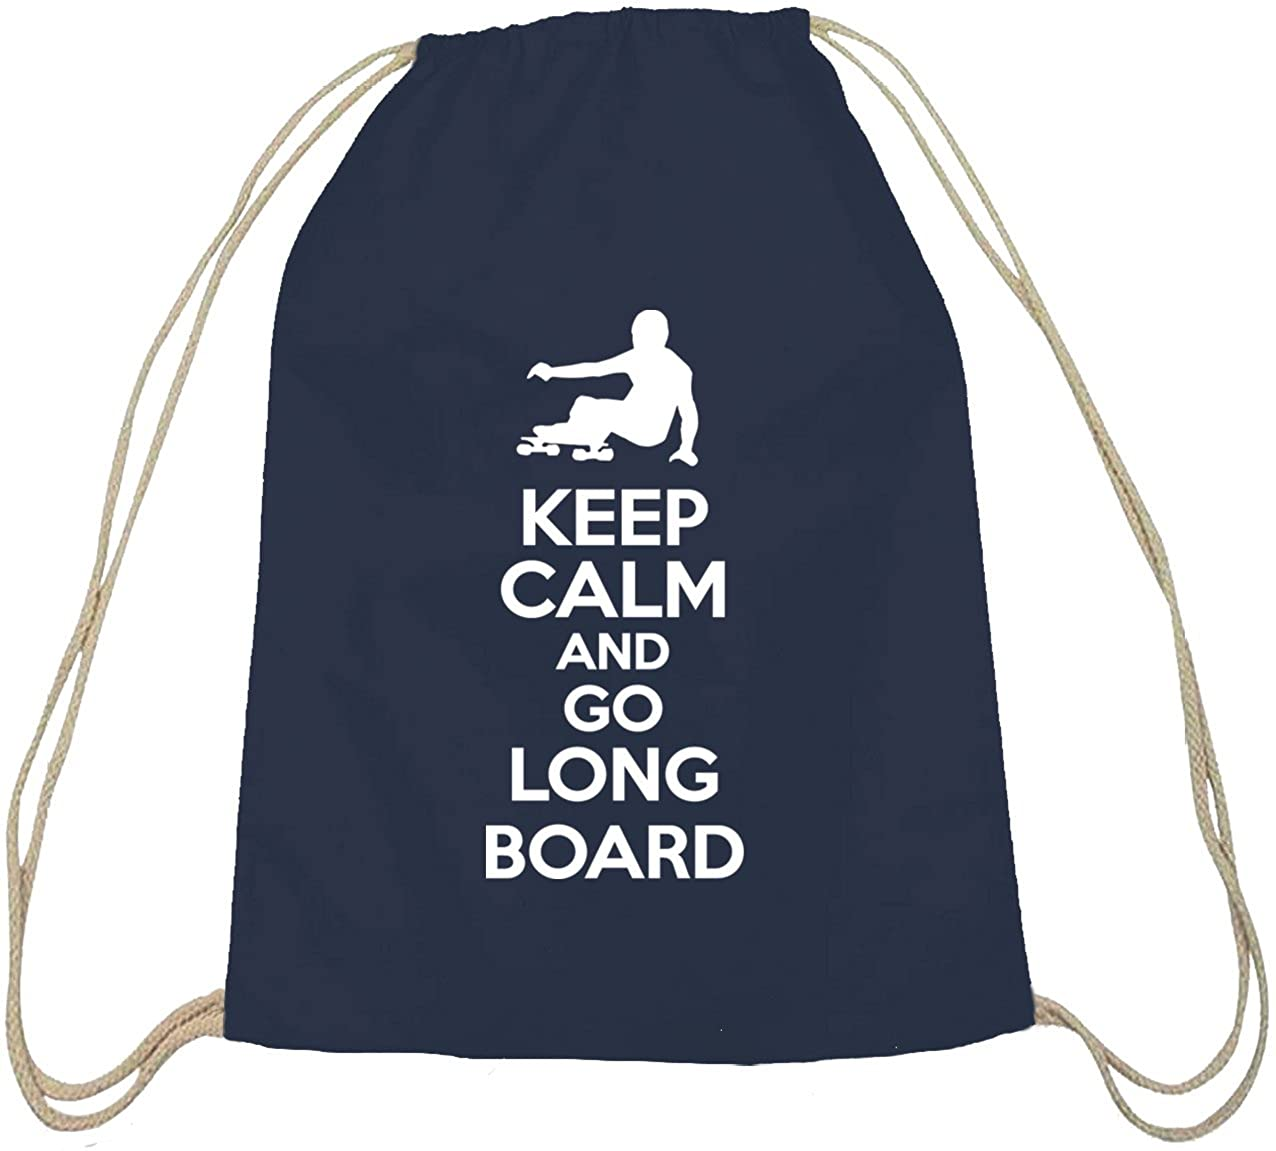 Shirtstreet24 keep calm and go skateboard longboard-coton nature sac de sport et sac /à dos